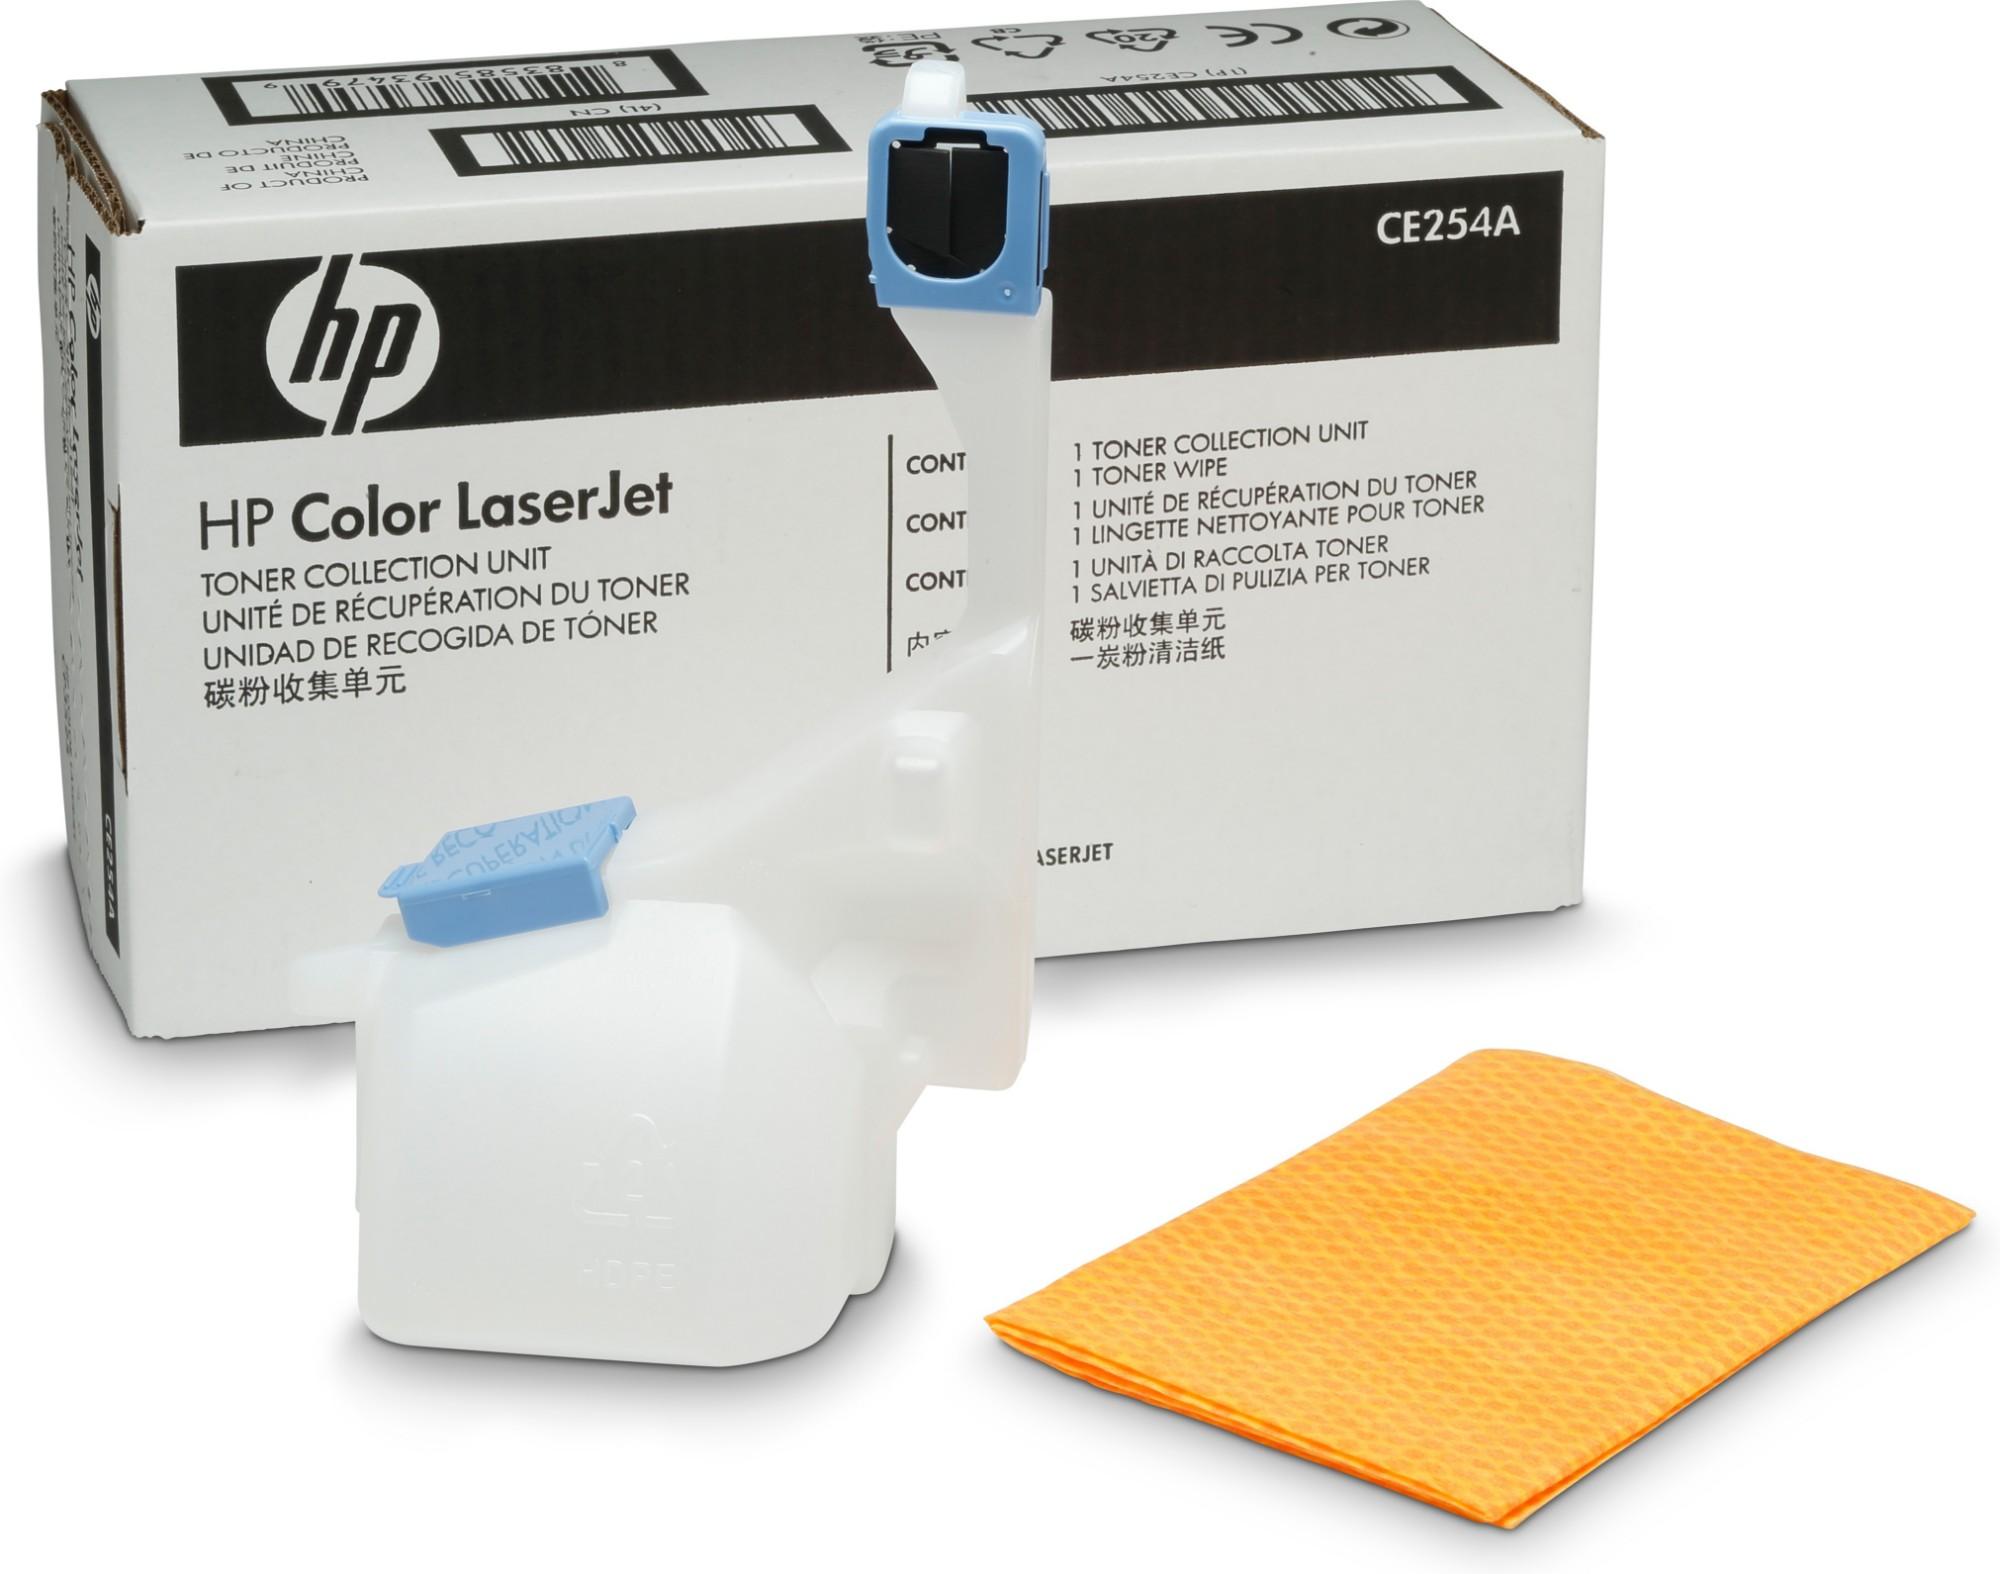 HP CE254A toner collector 36000 pagina's